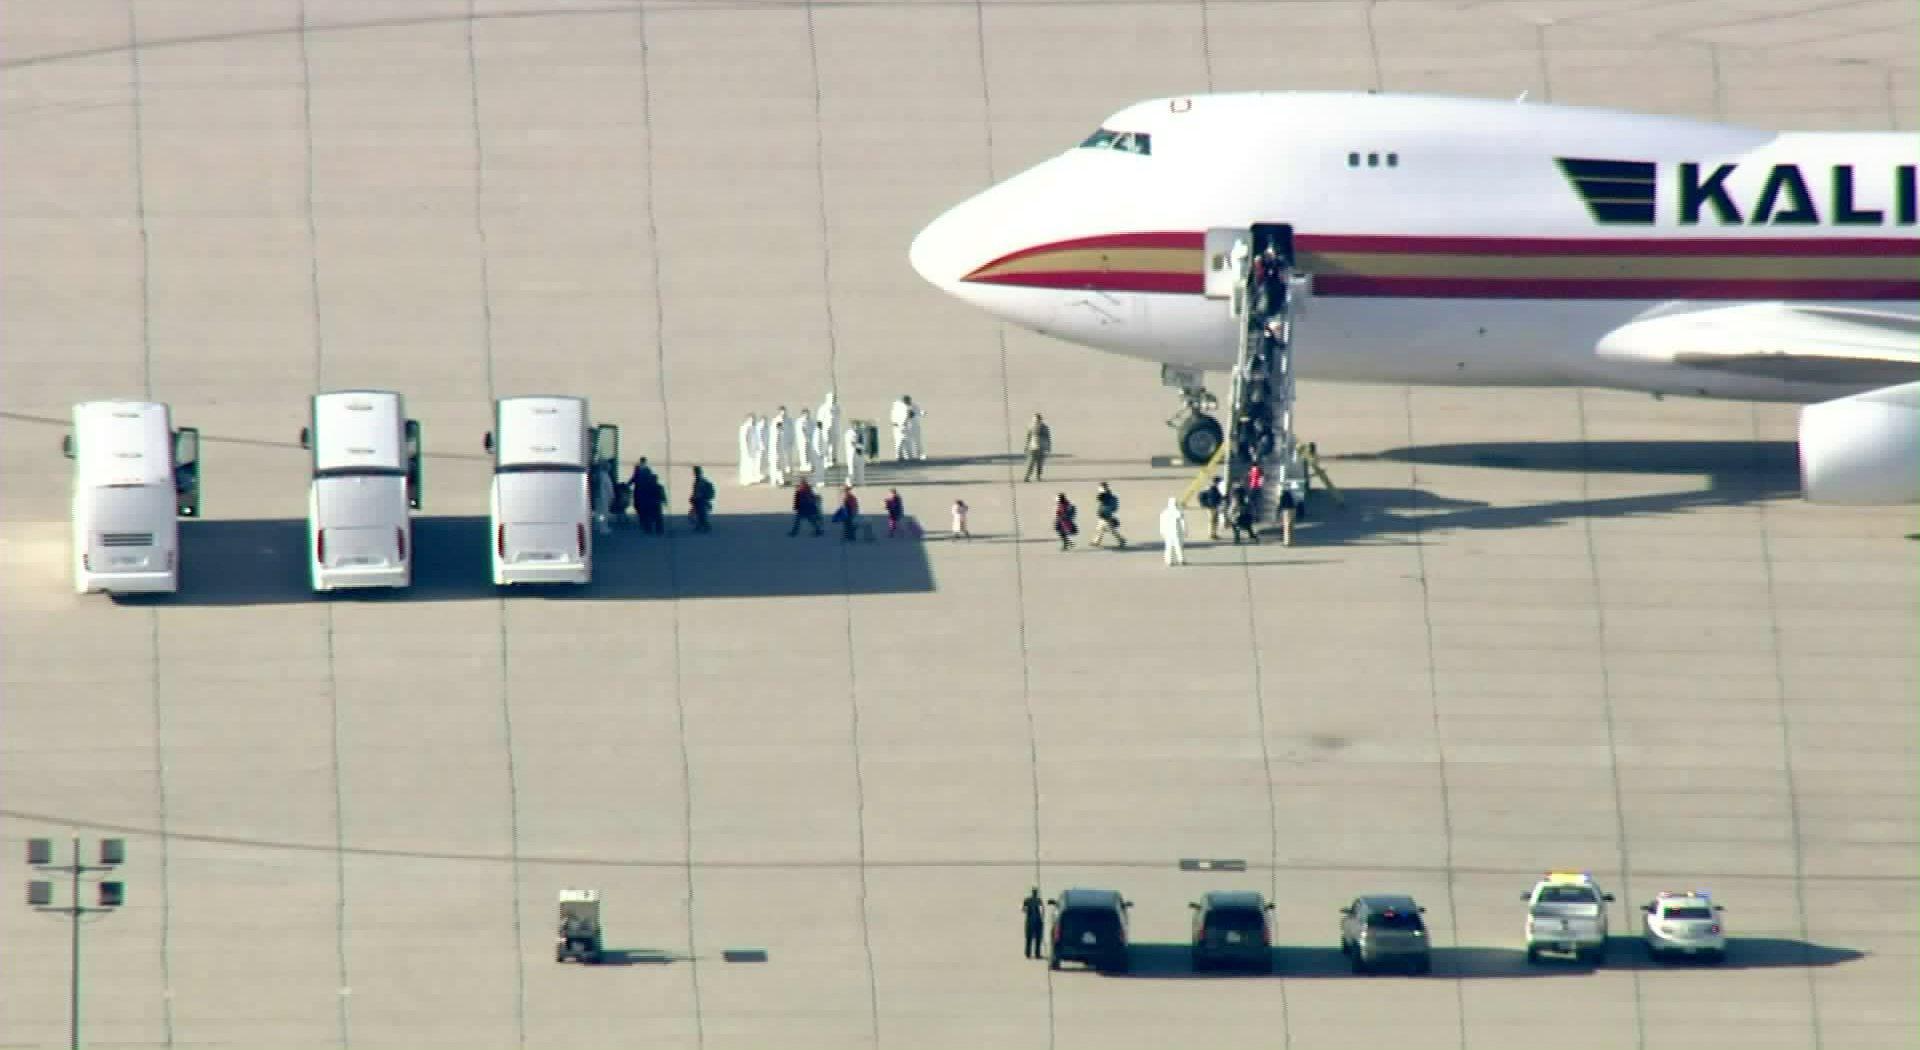 U.S. evacuees from China arrive at March Air Reserve Base near Riverside on Jan. 29, 2020, after passenger screenings in Alaska. (Credit: KTLA)